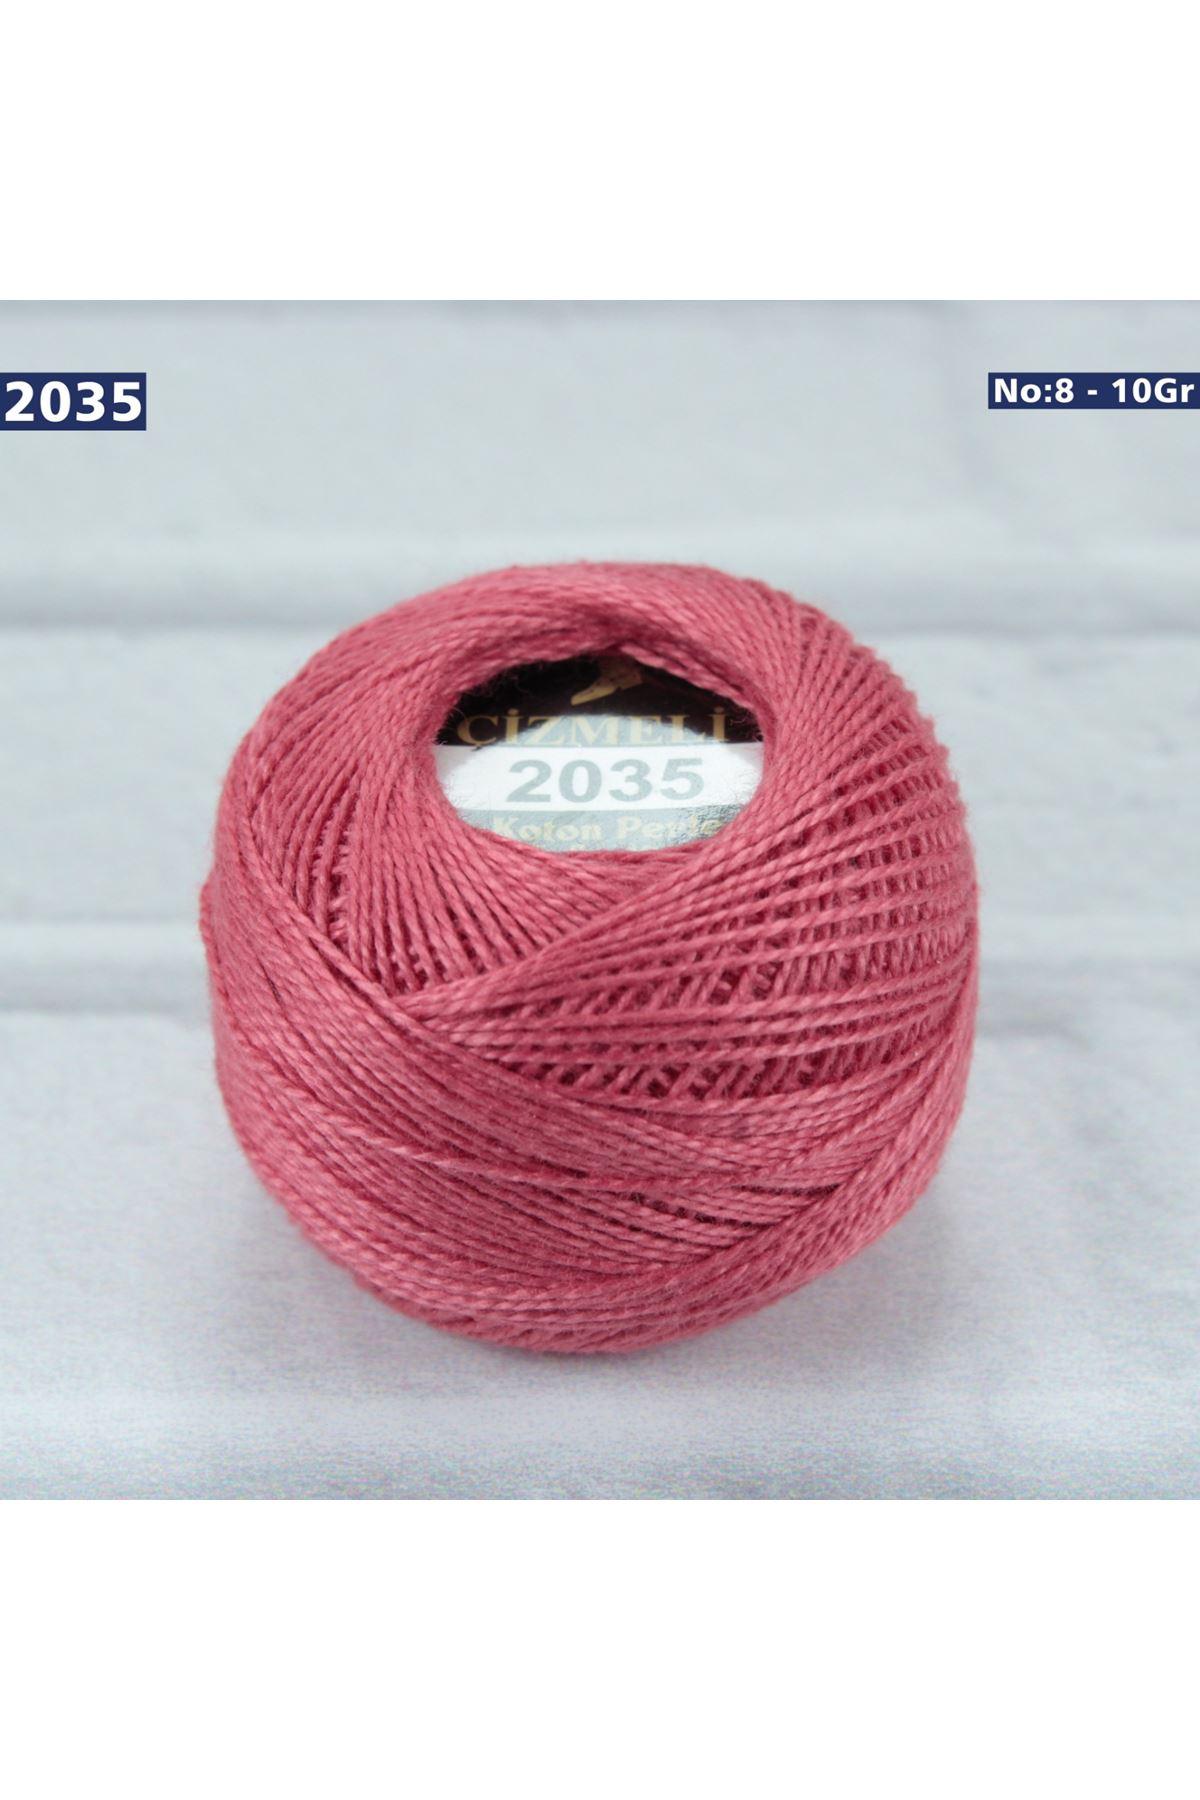 Çizmeli Cotton Perle Nakış İpliği No: 2035